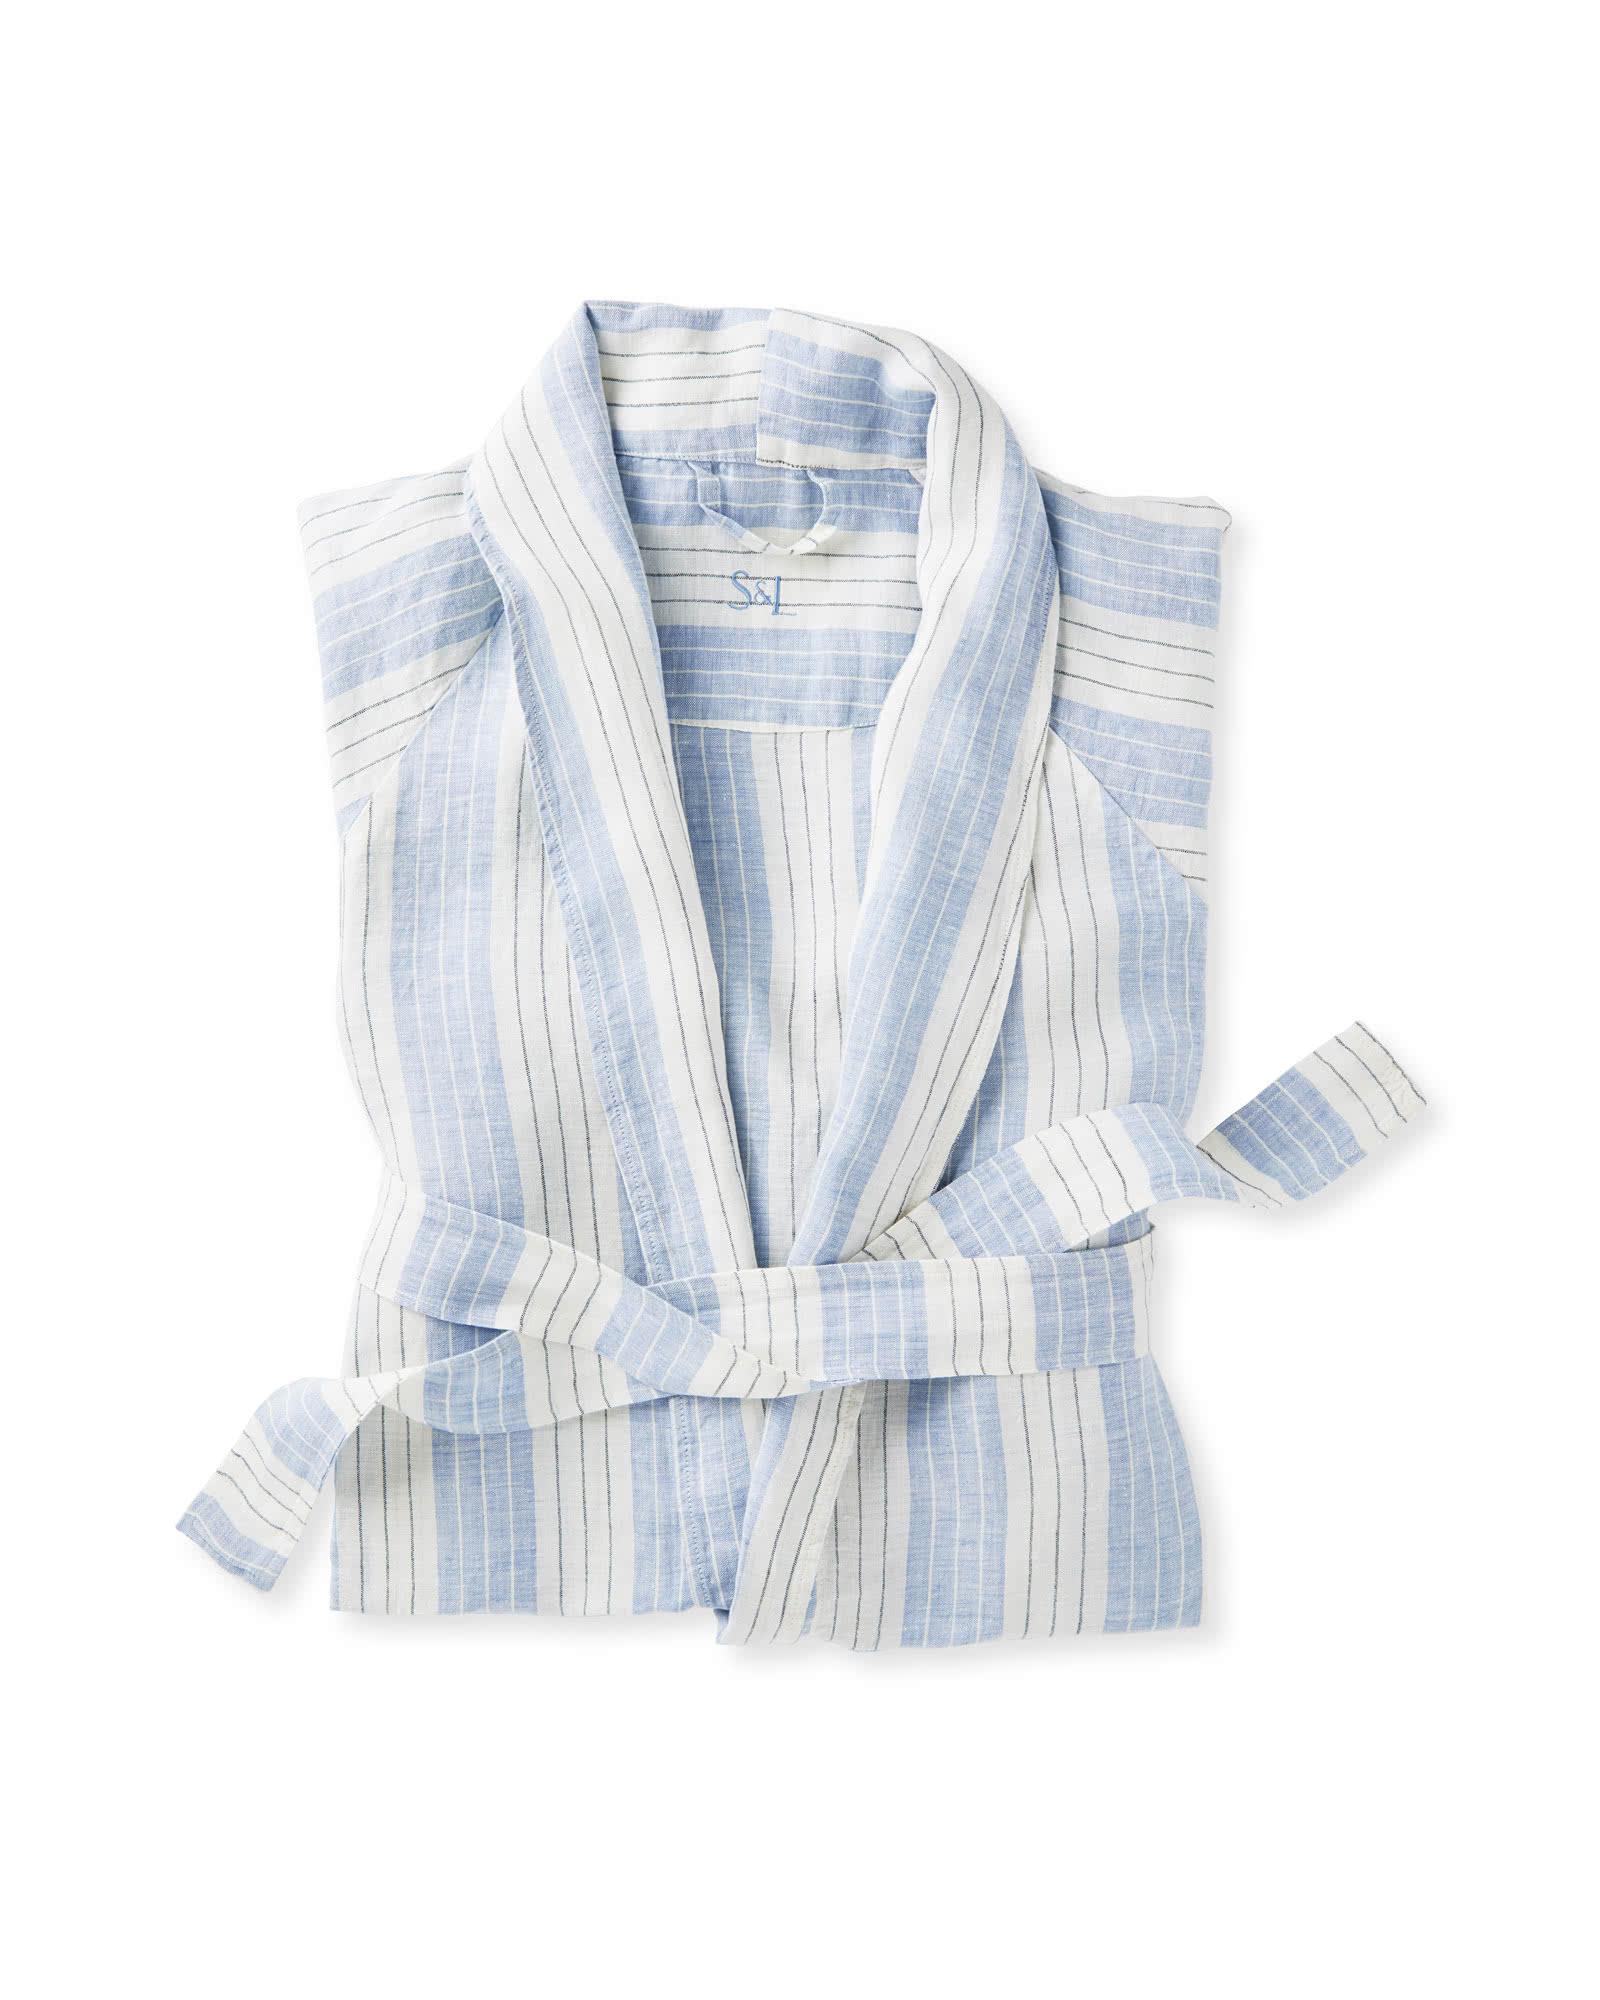 Porto Linen Robe $128.00